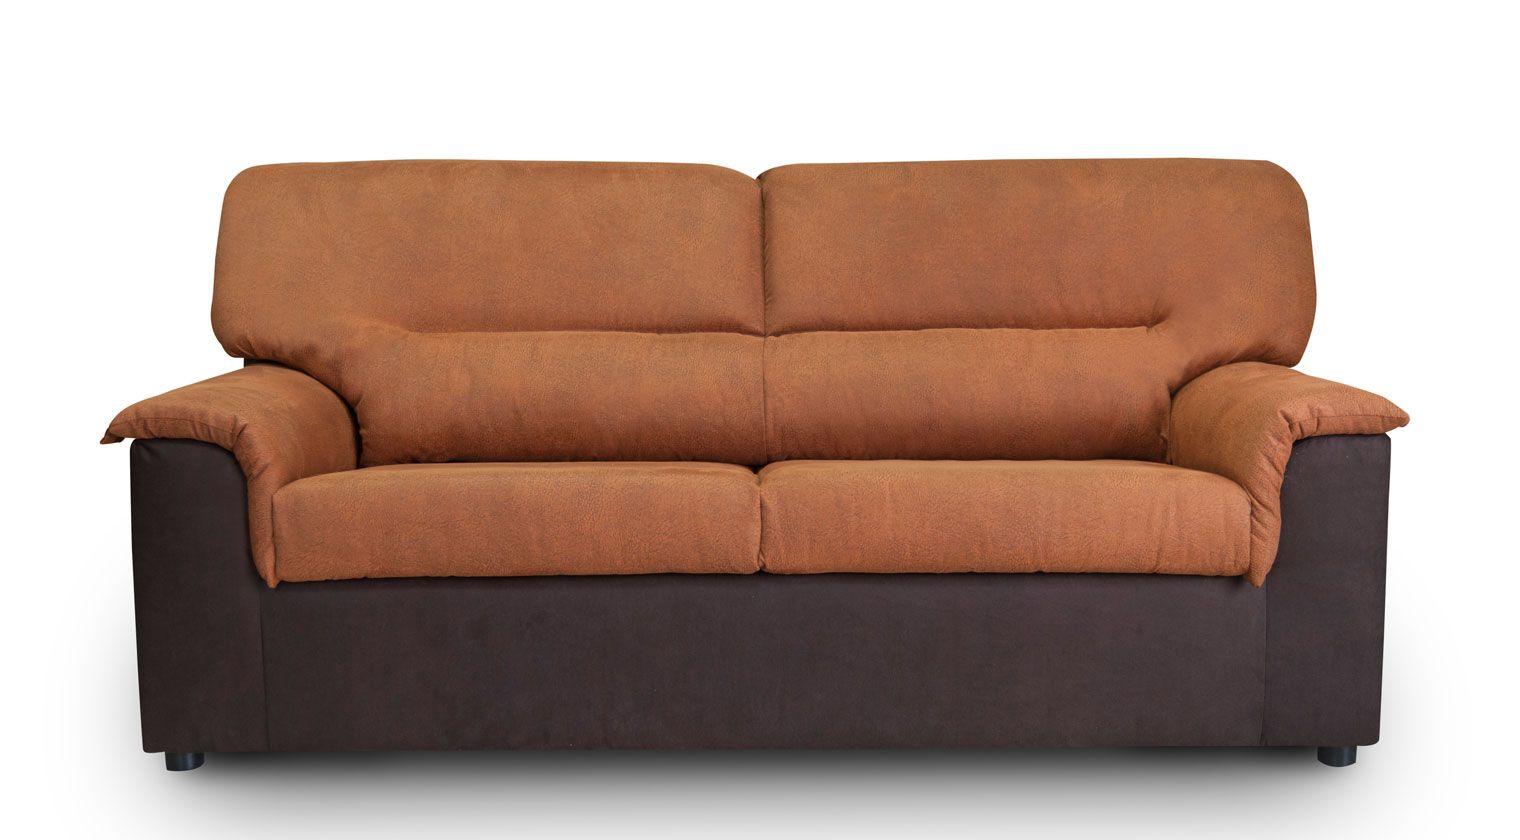 sof belen sofas de tela On sofa gran confort precios